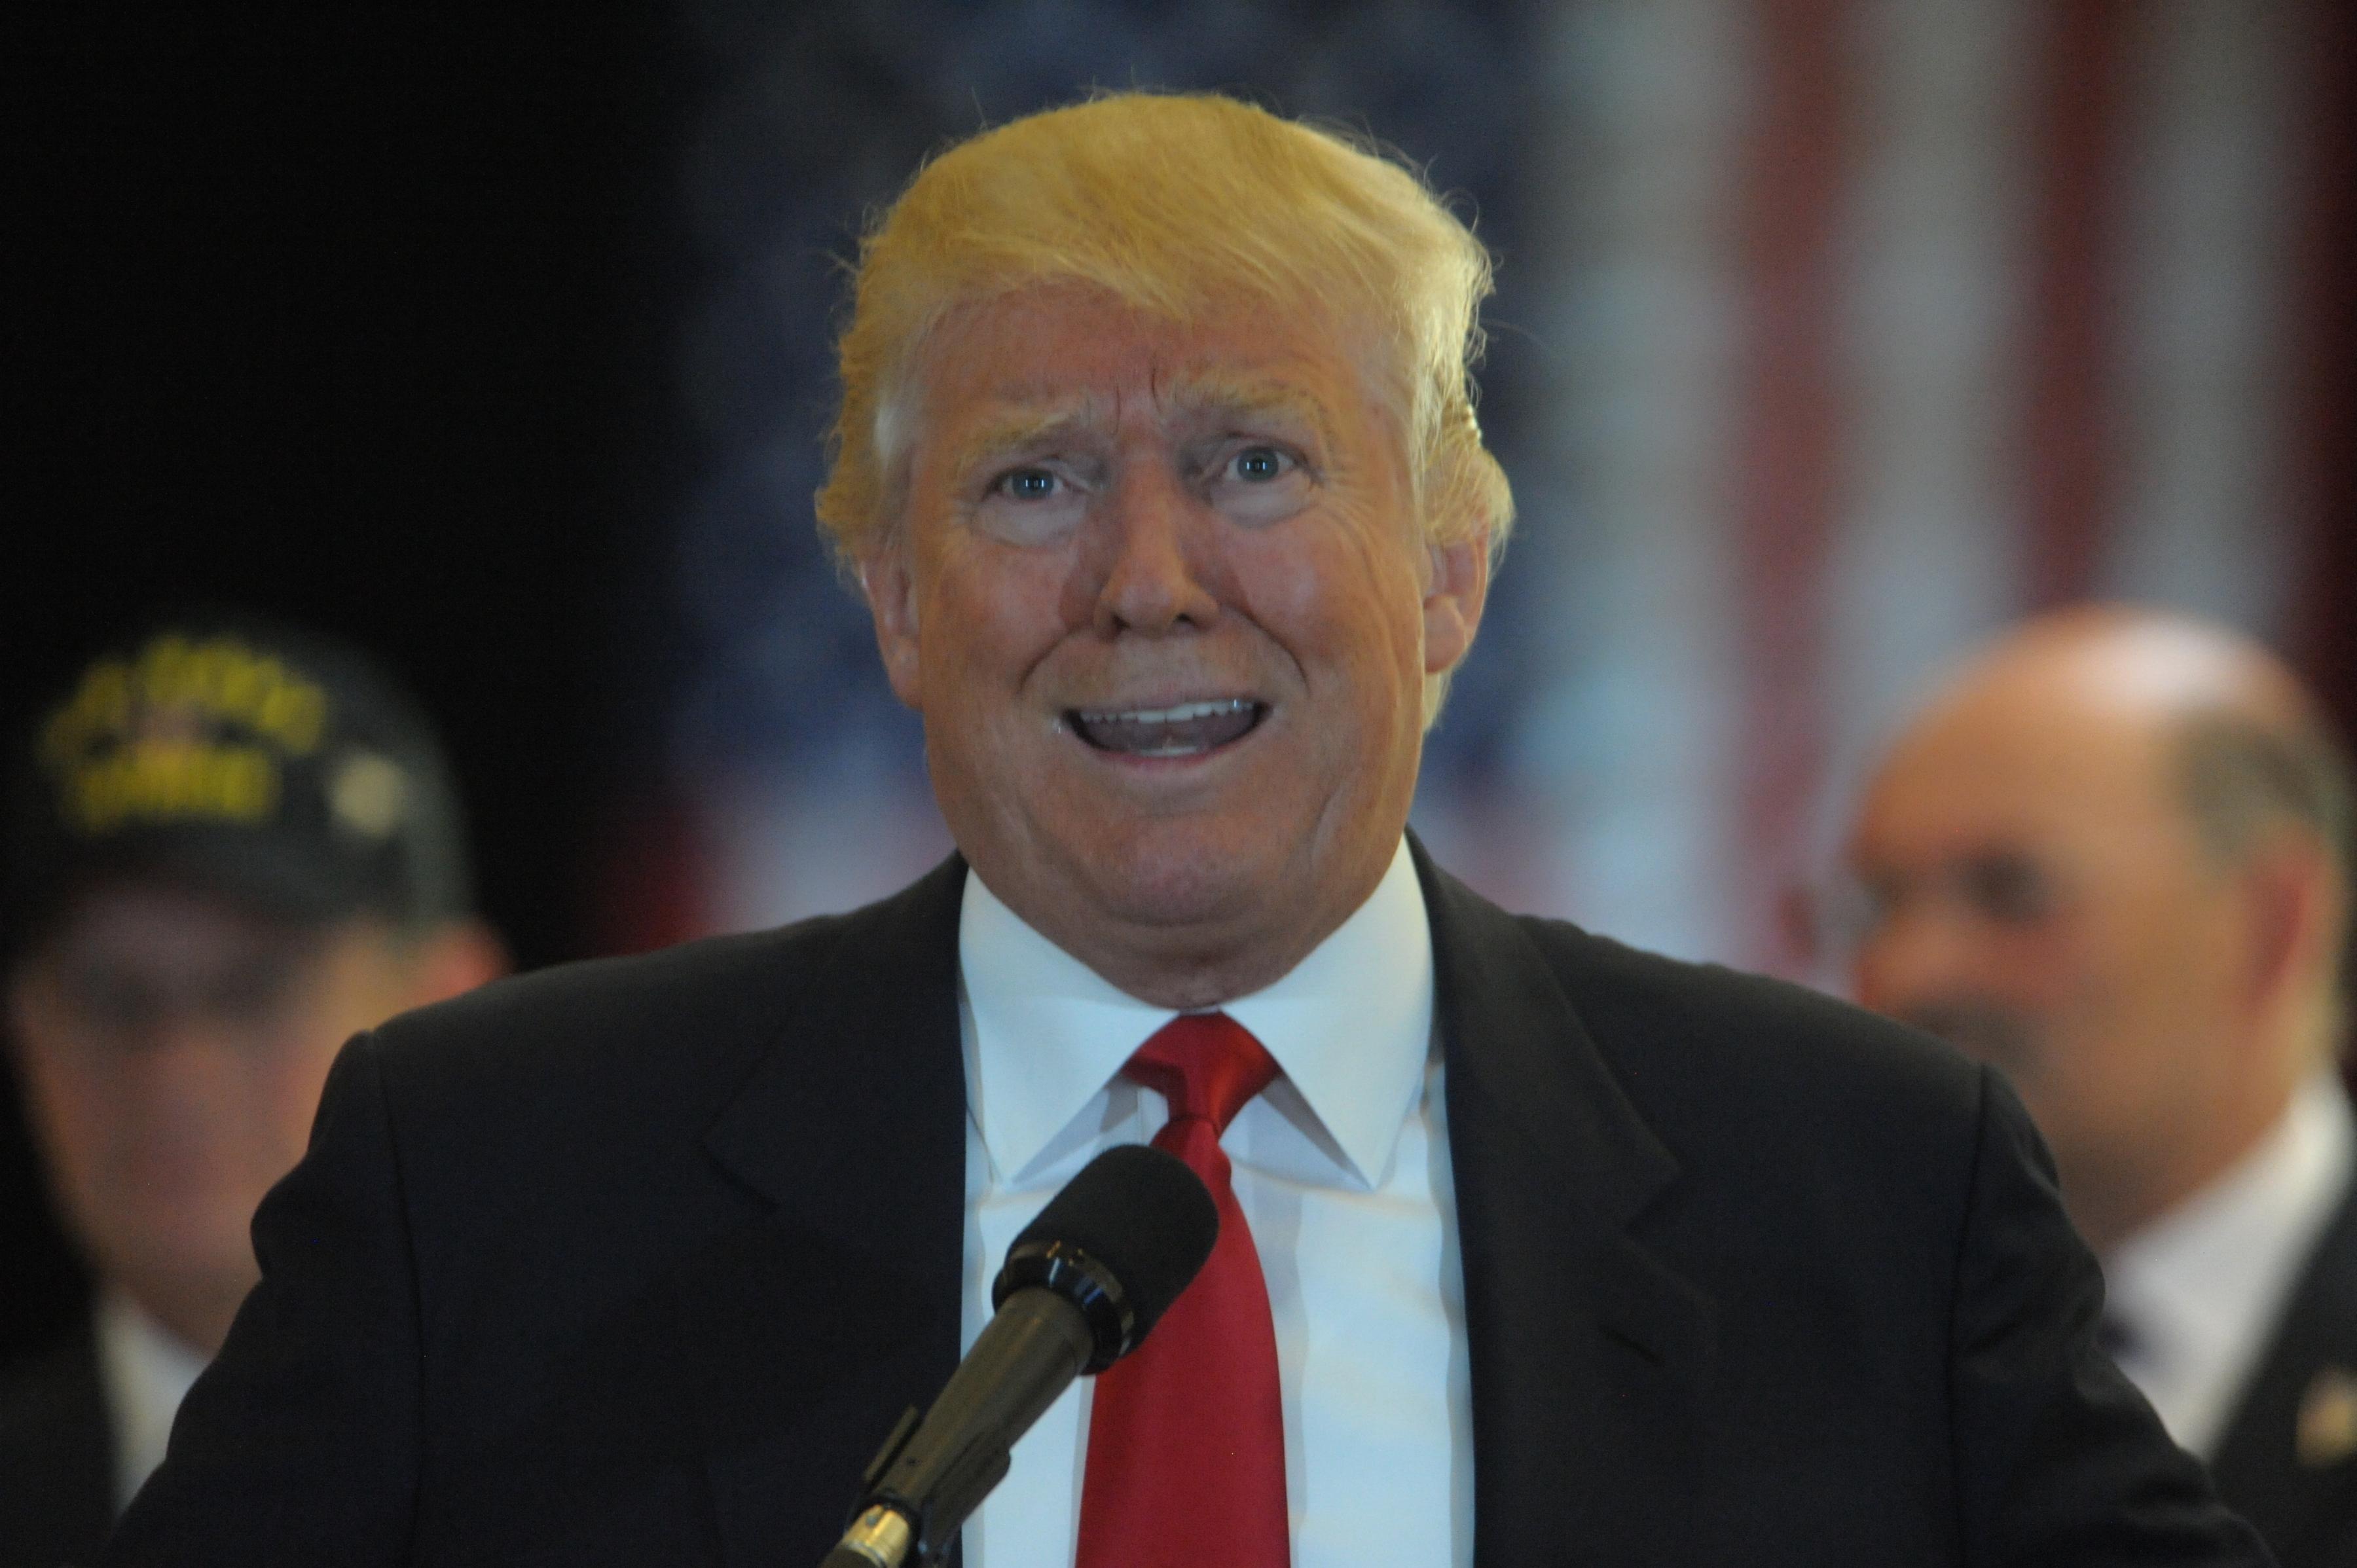 Donald Trump detailed failure to pick up Kelly Preston in condolence post